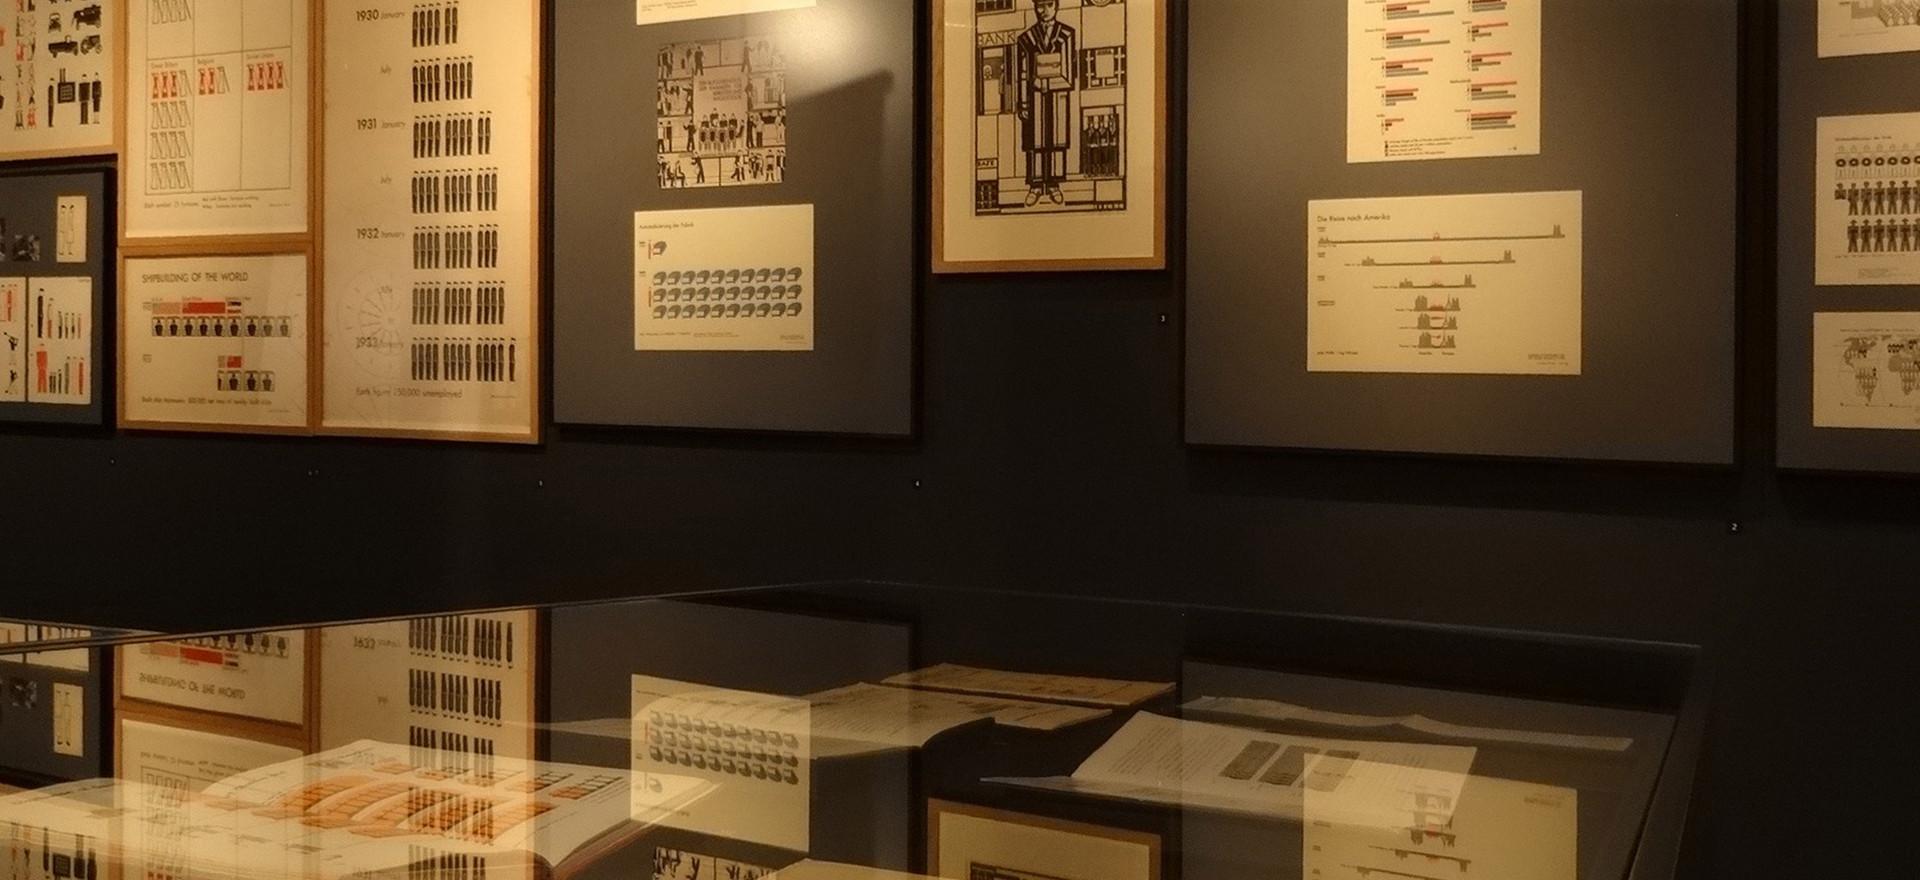 Bildfabriken. Infografik 1920 - 1945